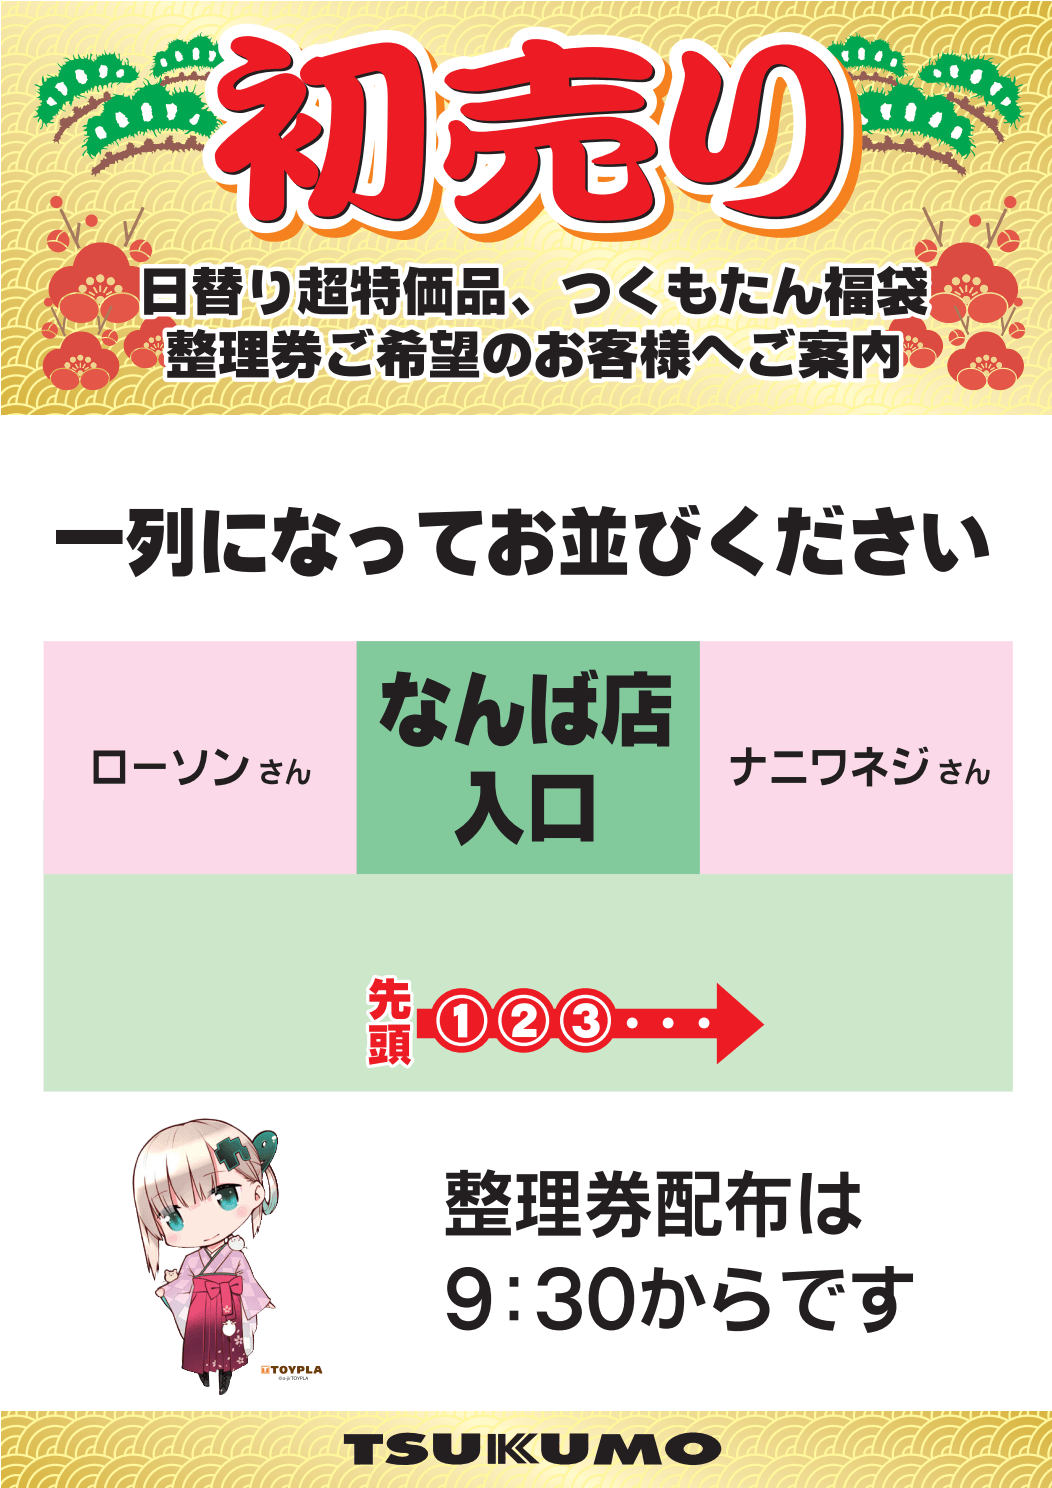 Hatsuuri_2020_Narabi.png